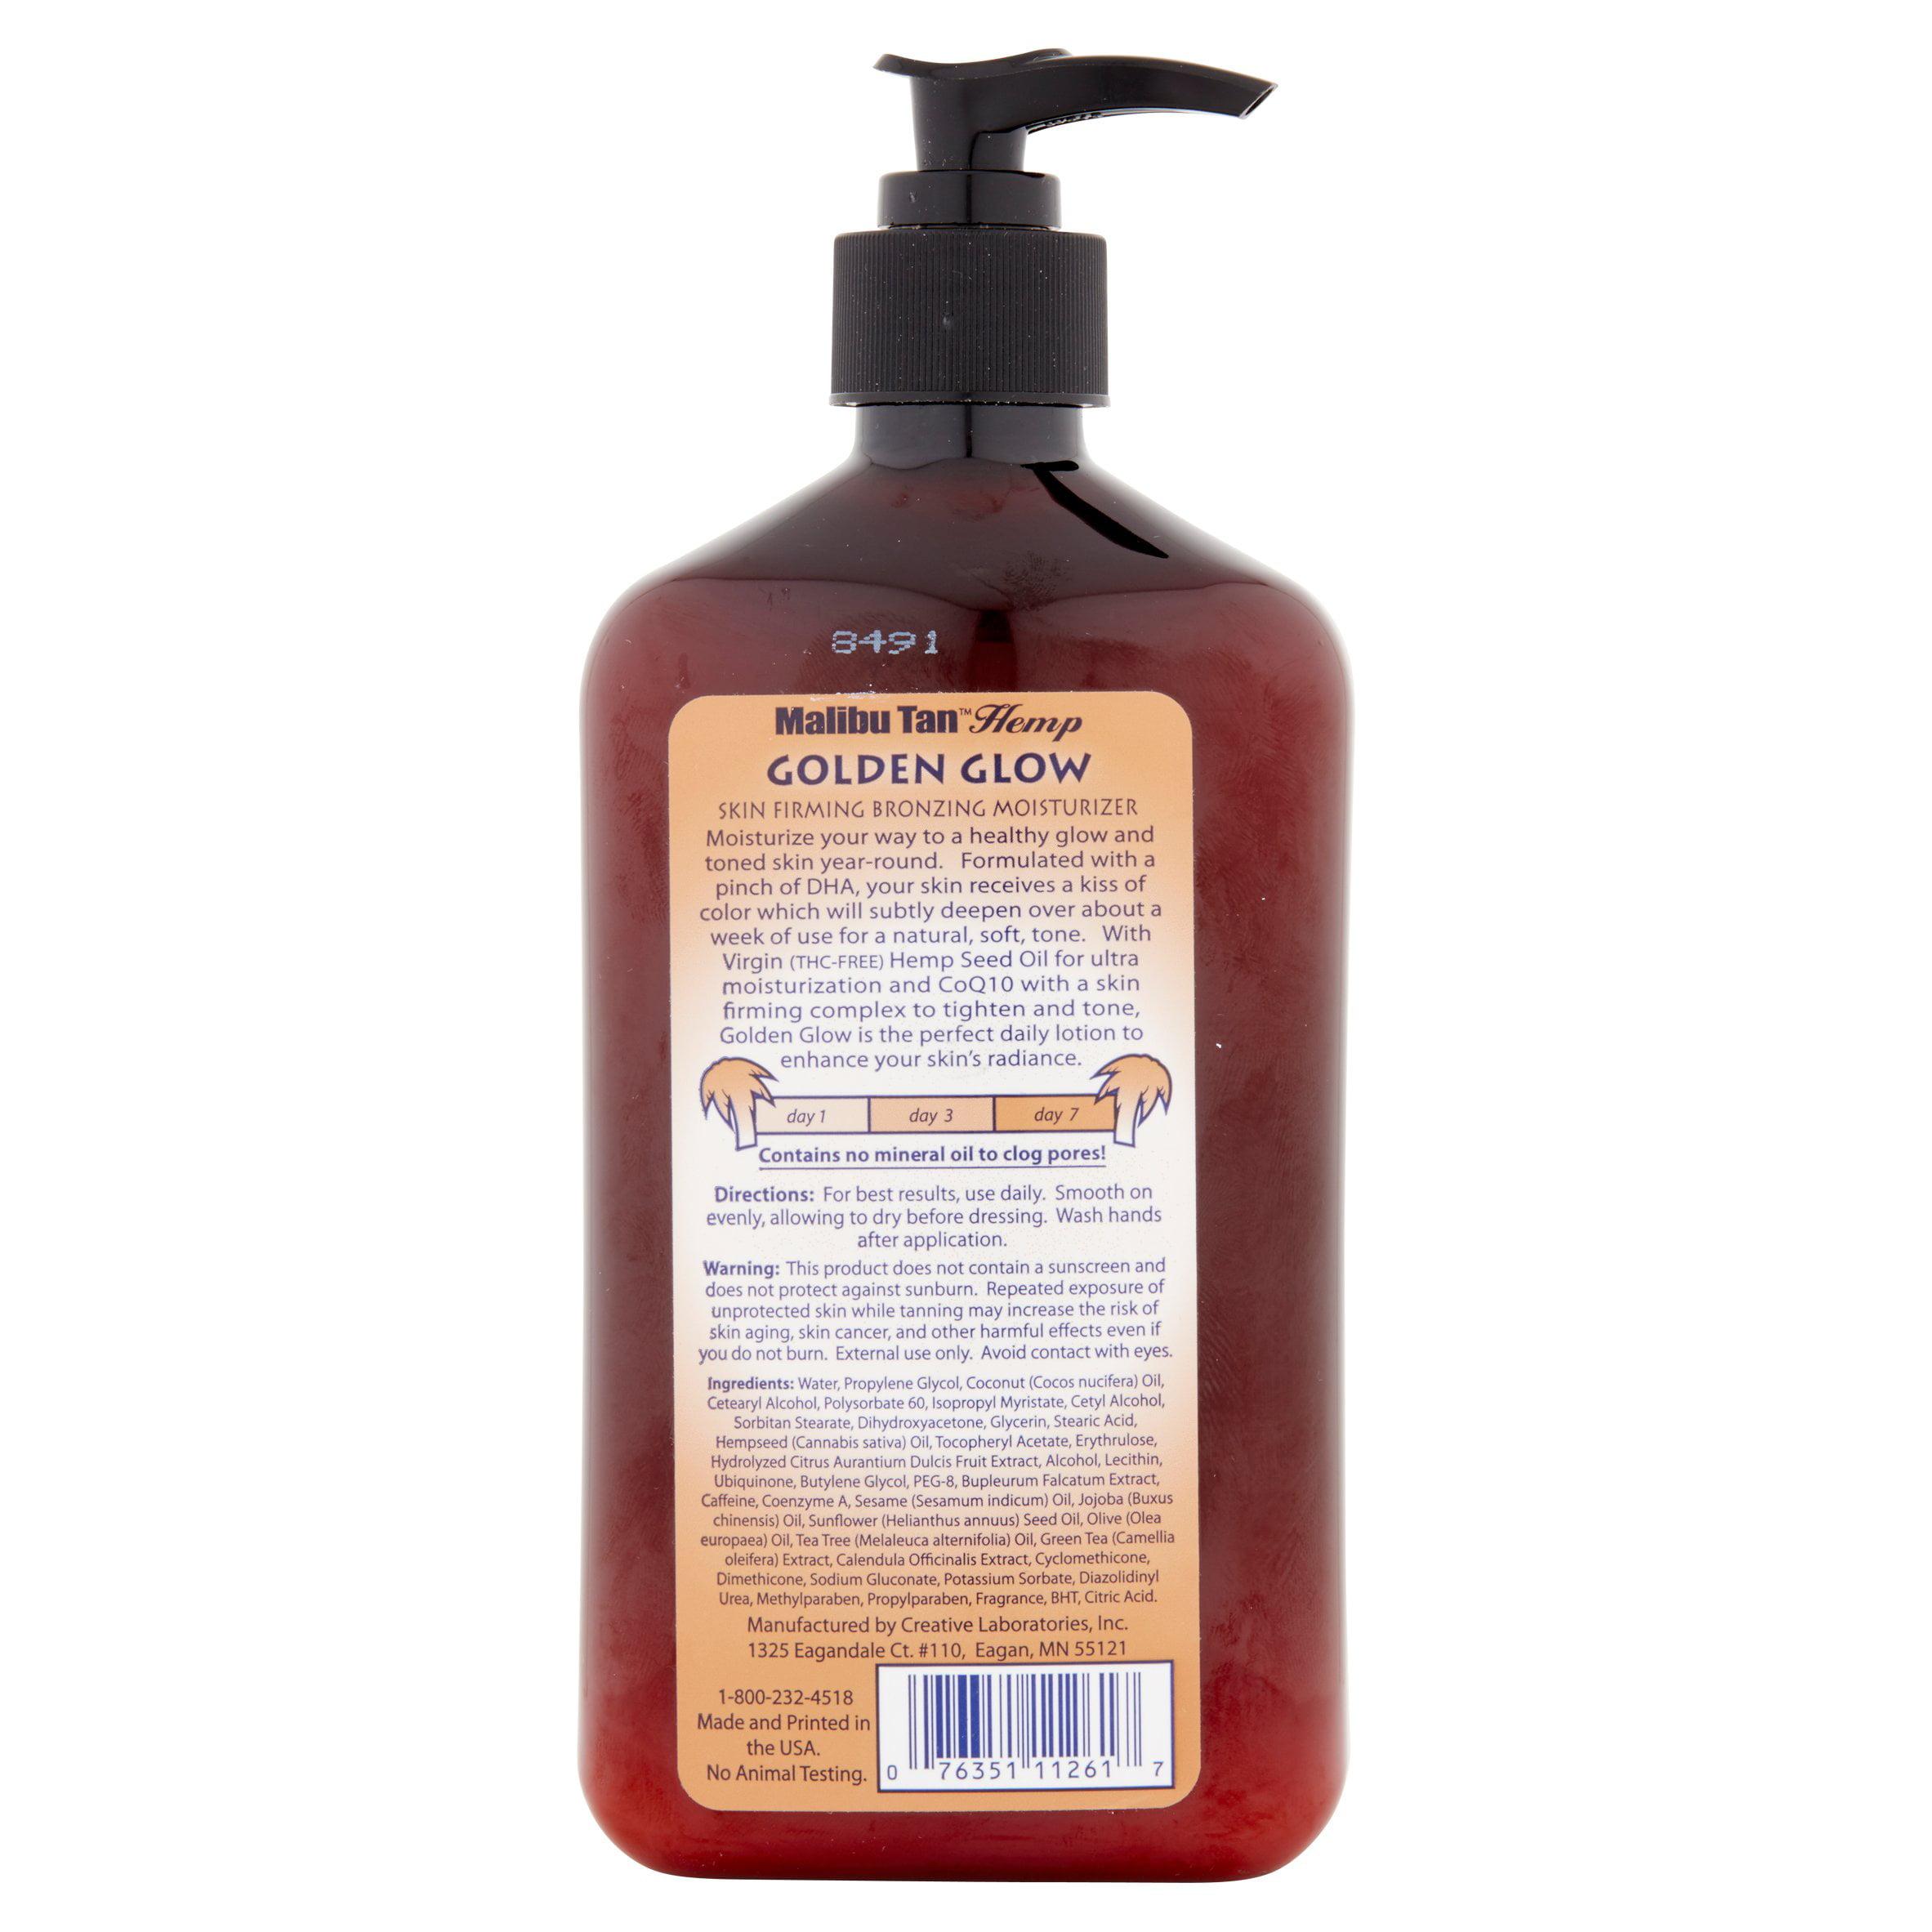 Malibu Tan Hemp Golden Glow Skin Firming Bronzing Moisturizer, 18 Fl Oz   Walmart